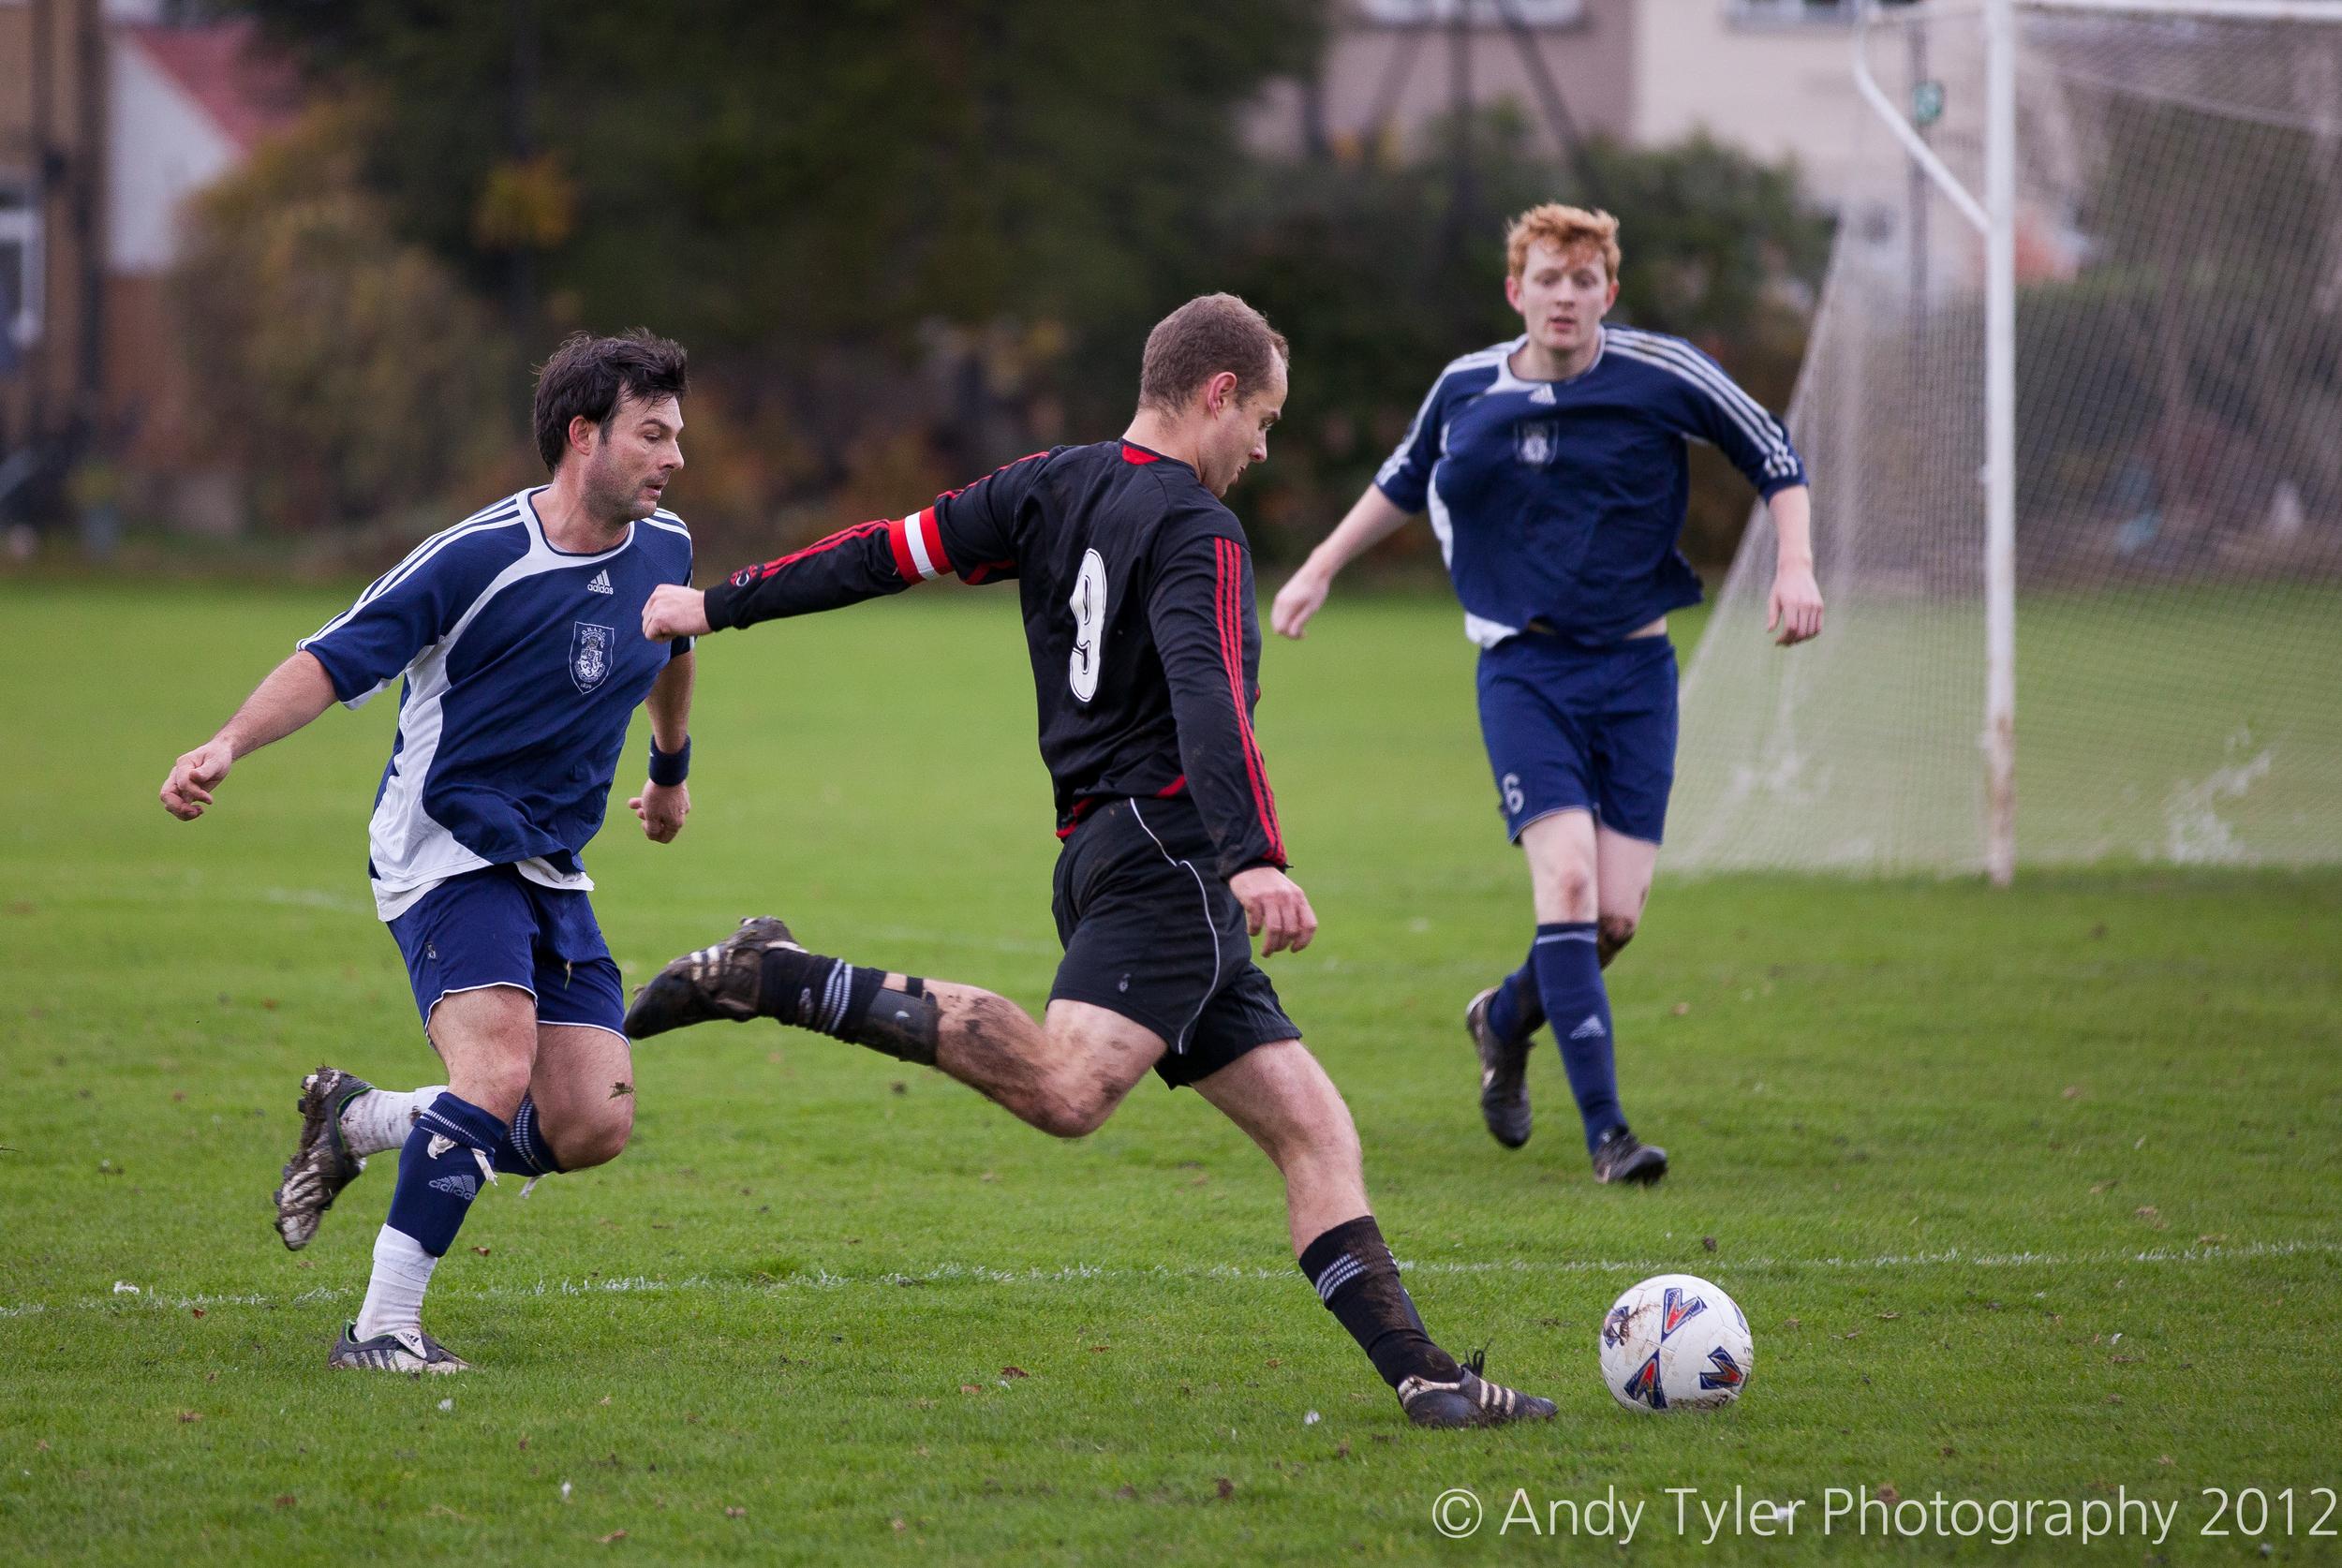 KCSOBFC 1st XI vs Harrow-087.jpg